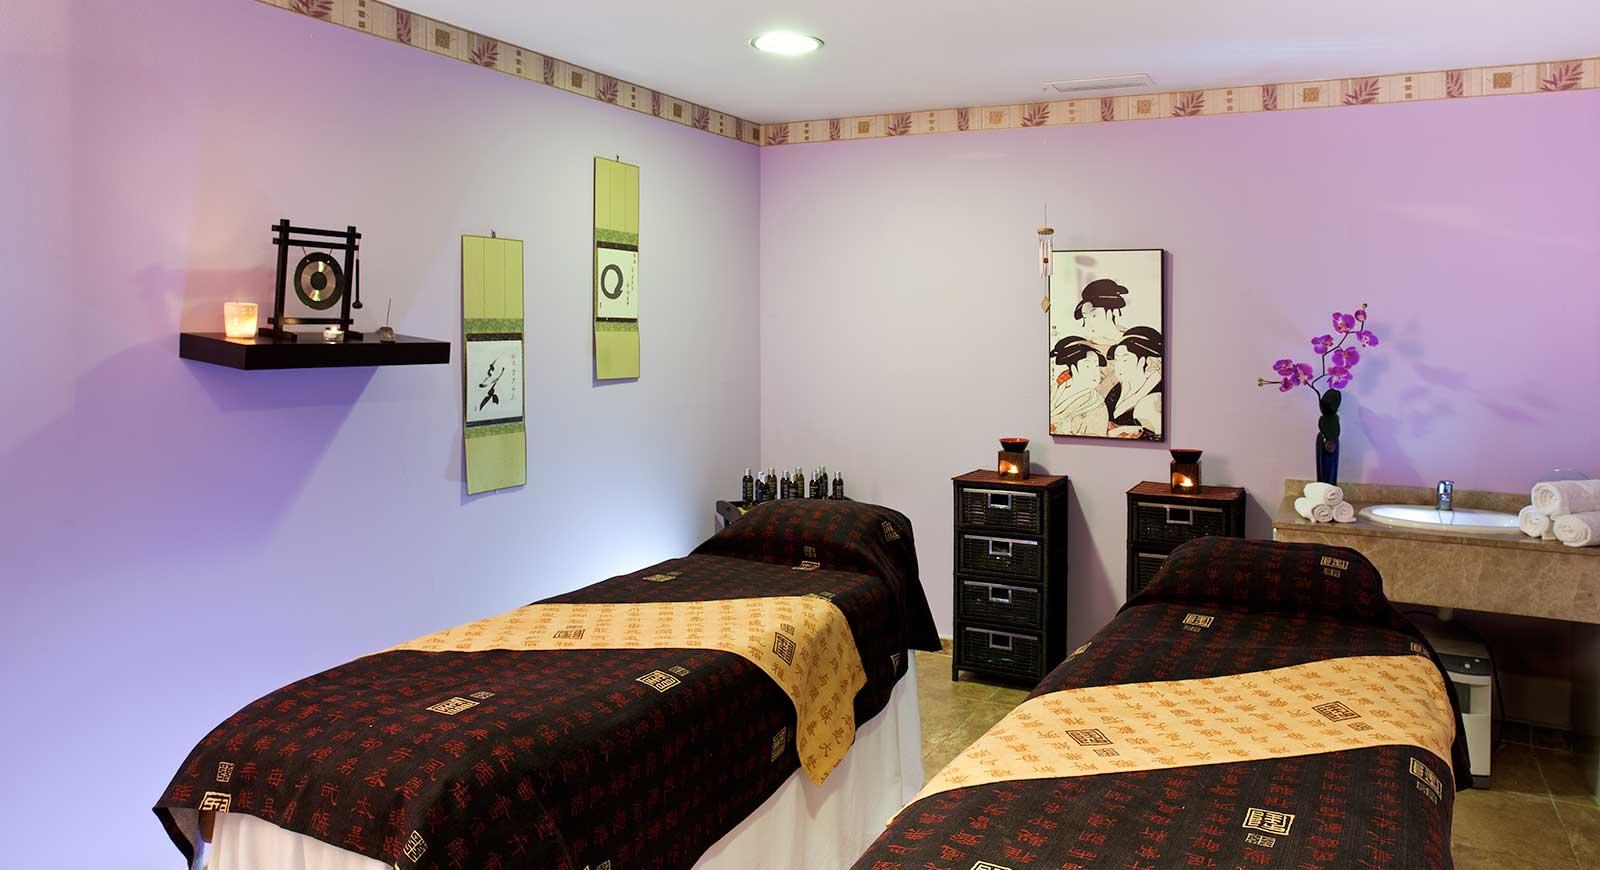 236-spa-3-hotel-barcelo-cabo-de-gata_tcm20-8411_w1600_h870_n.jpg